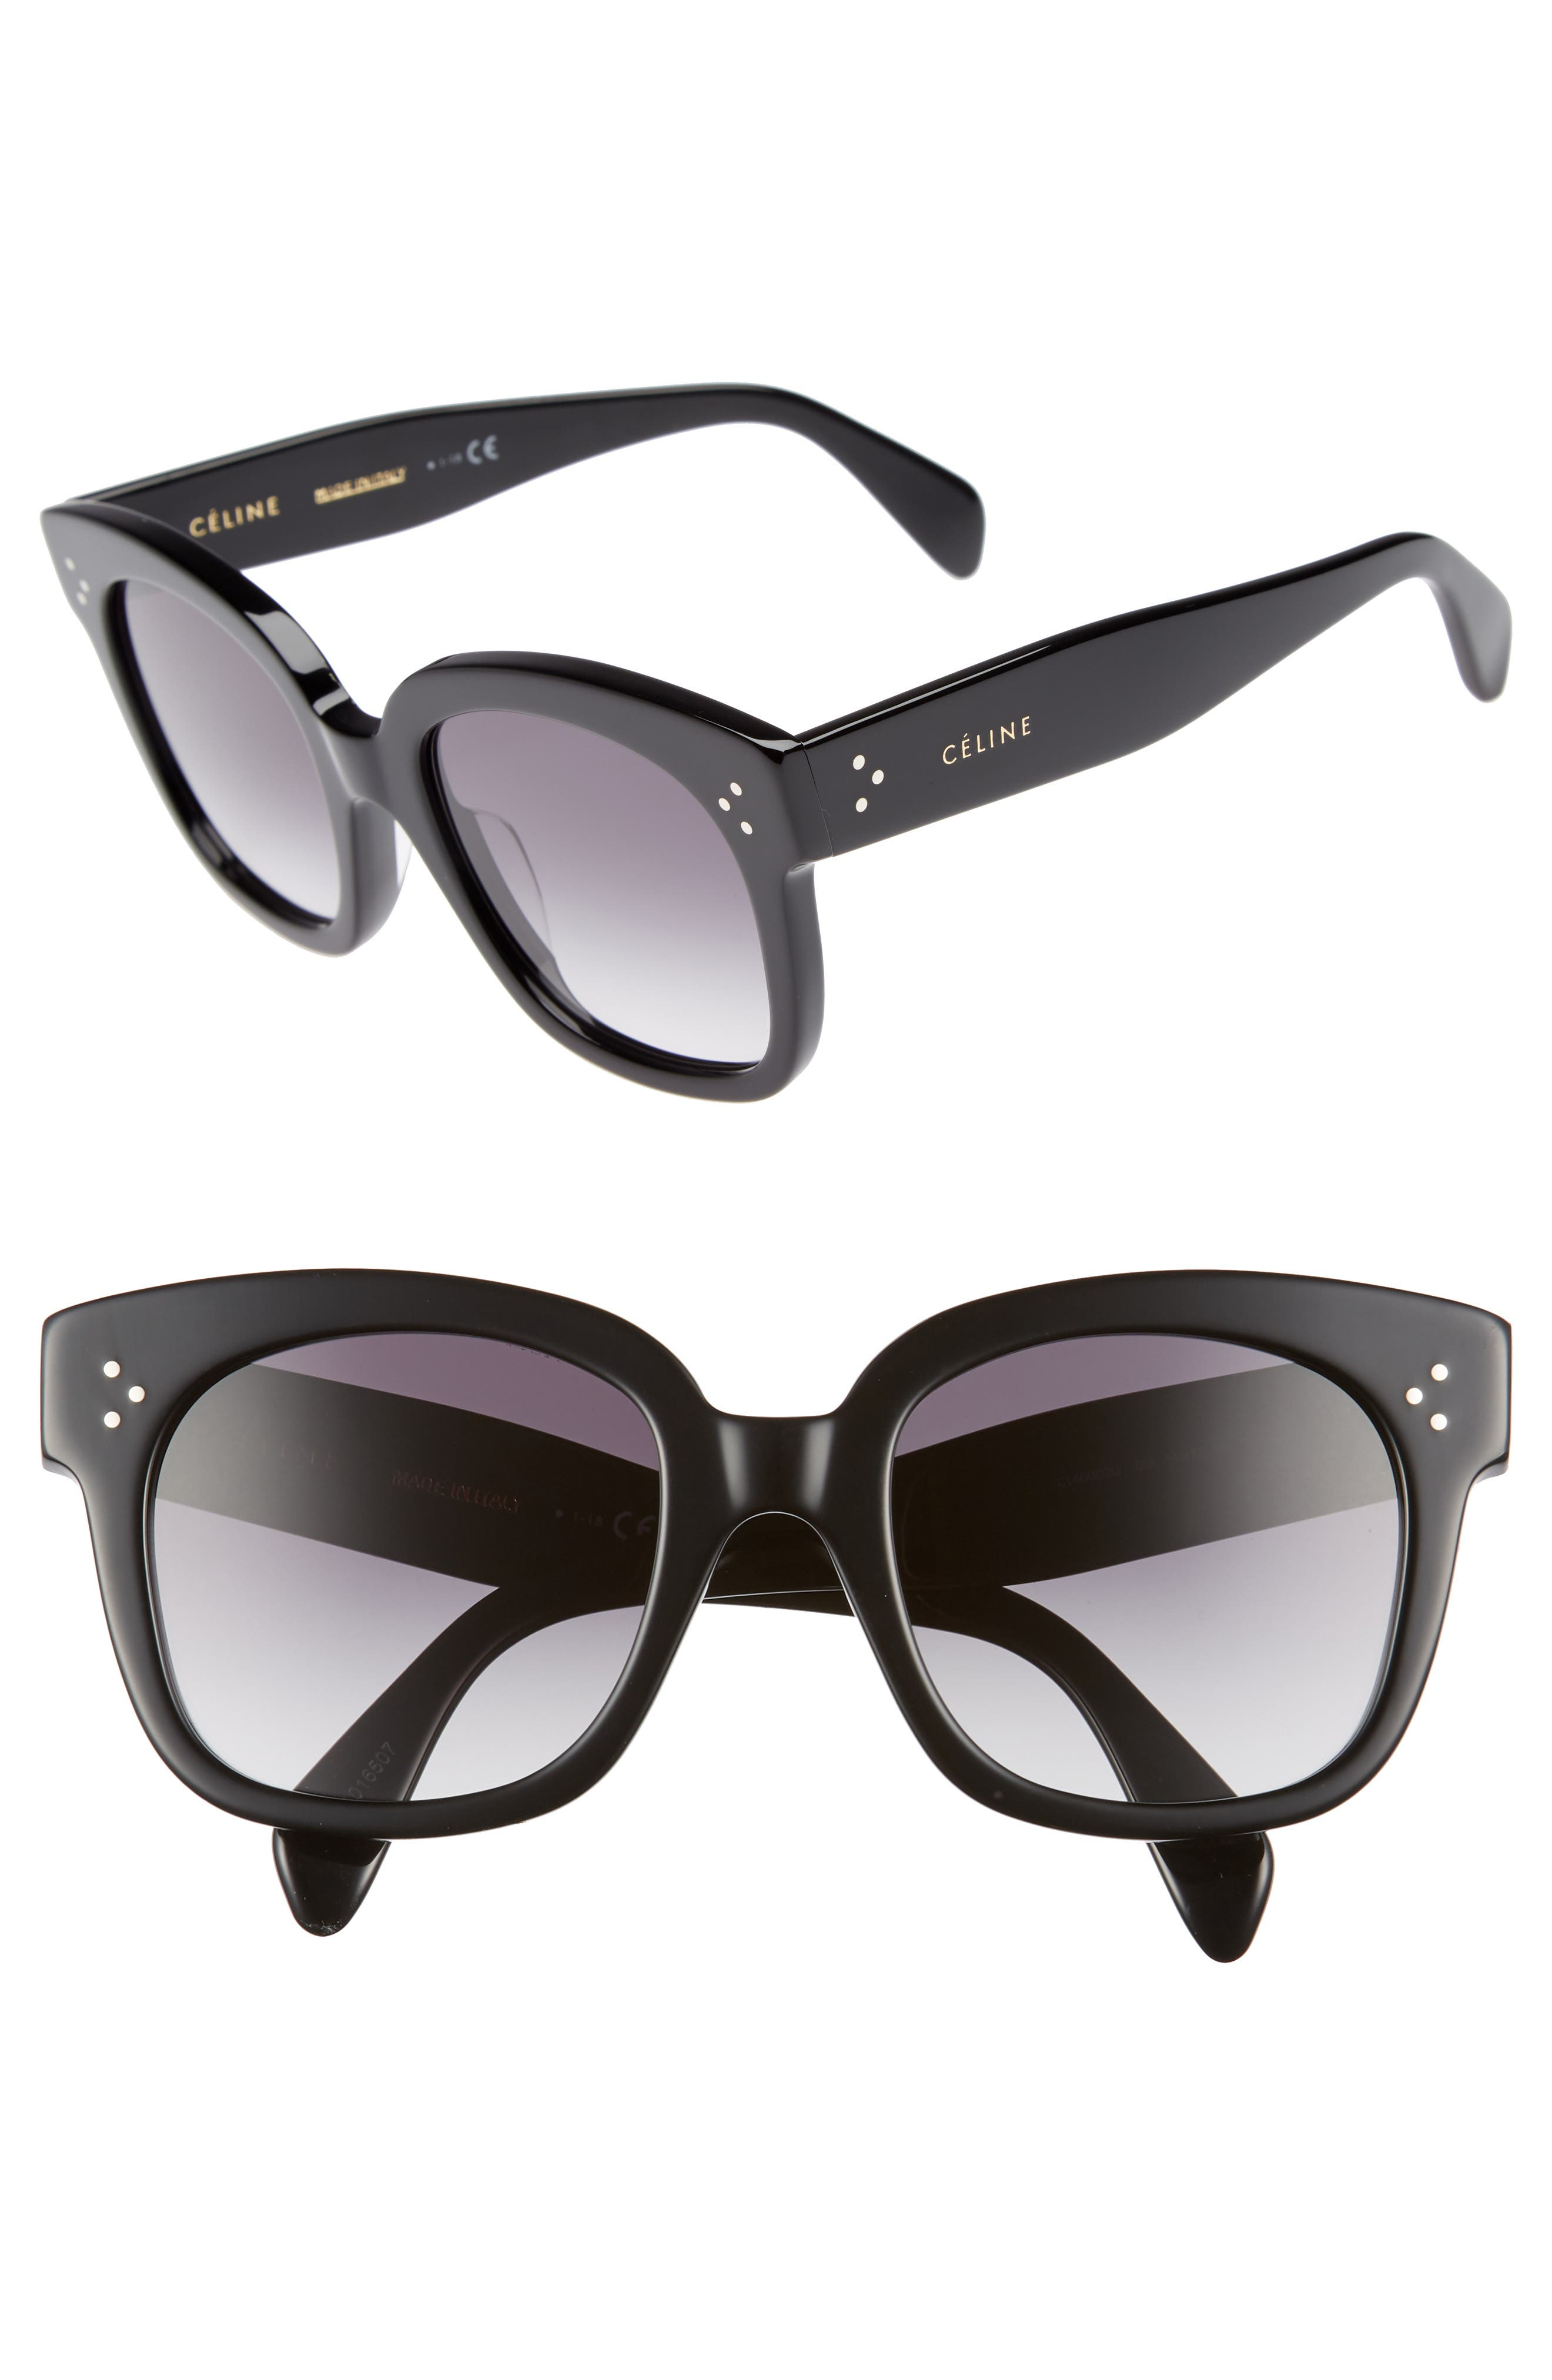 687398aa123a CELINE Sunglasses for Women | Nordstrom